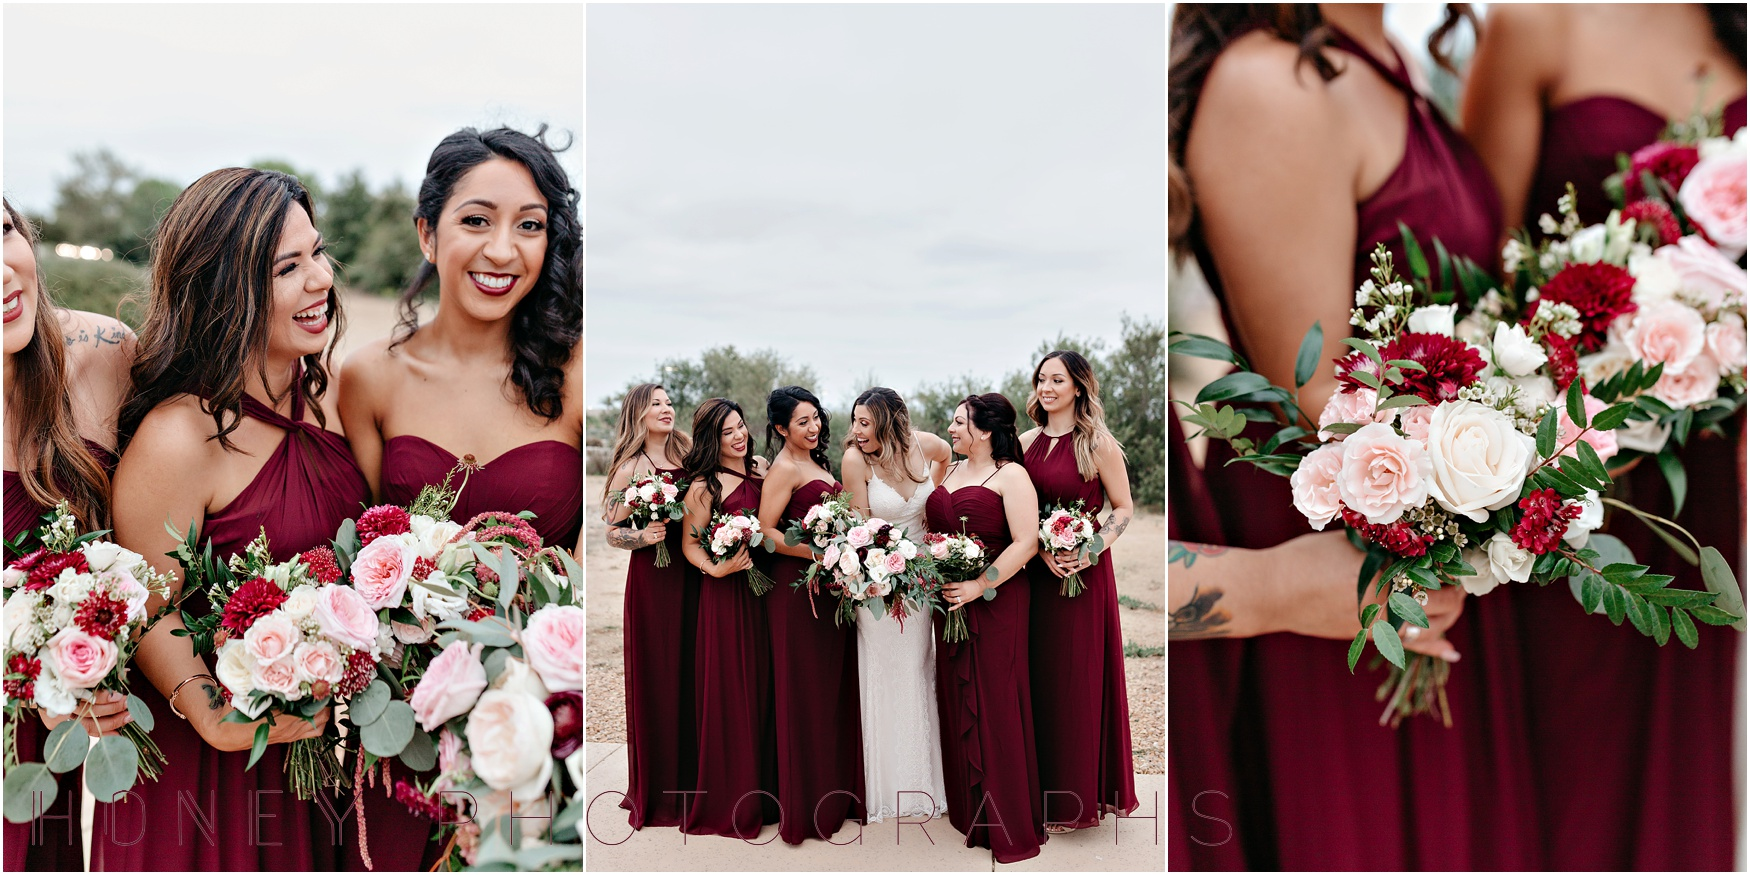 garden-classic-burgundy-jewel-tone-luxury-pacific-event-oceanside-wedding39.jpg